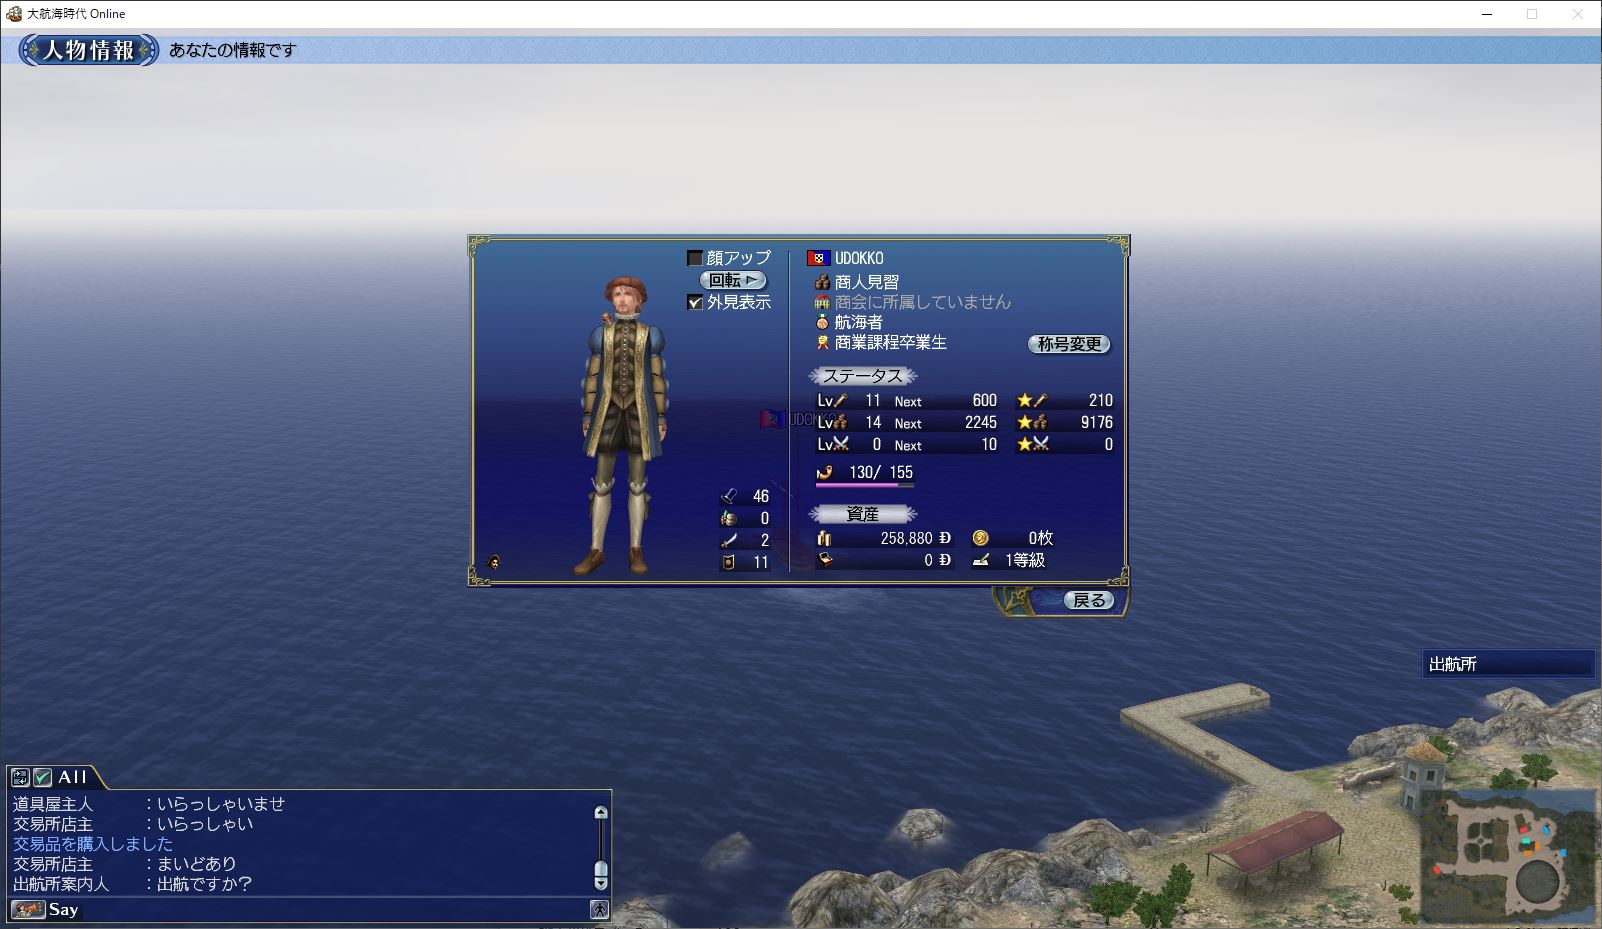 大航海時代オンライン 航海日記2日目